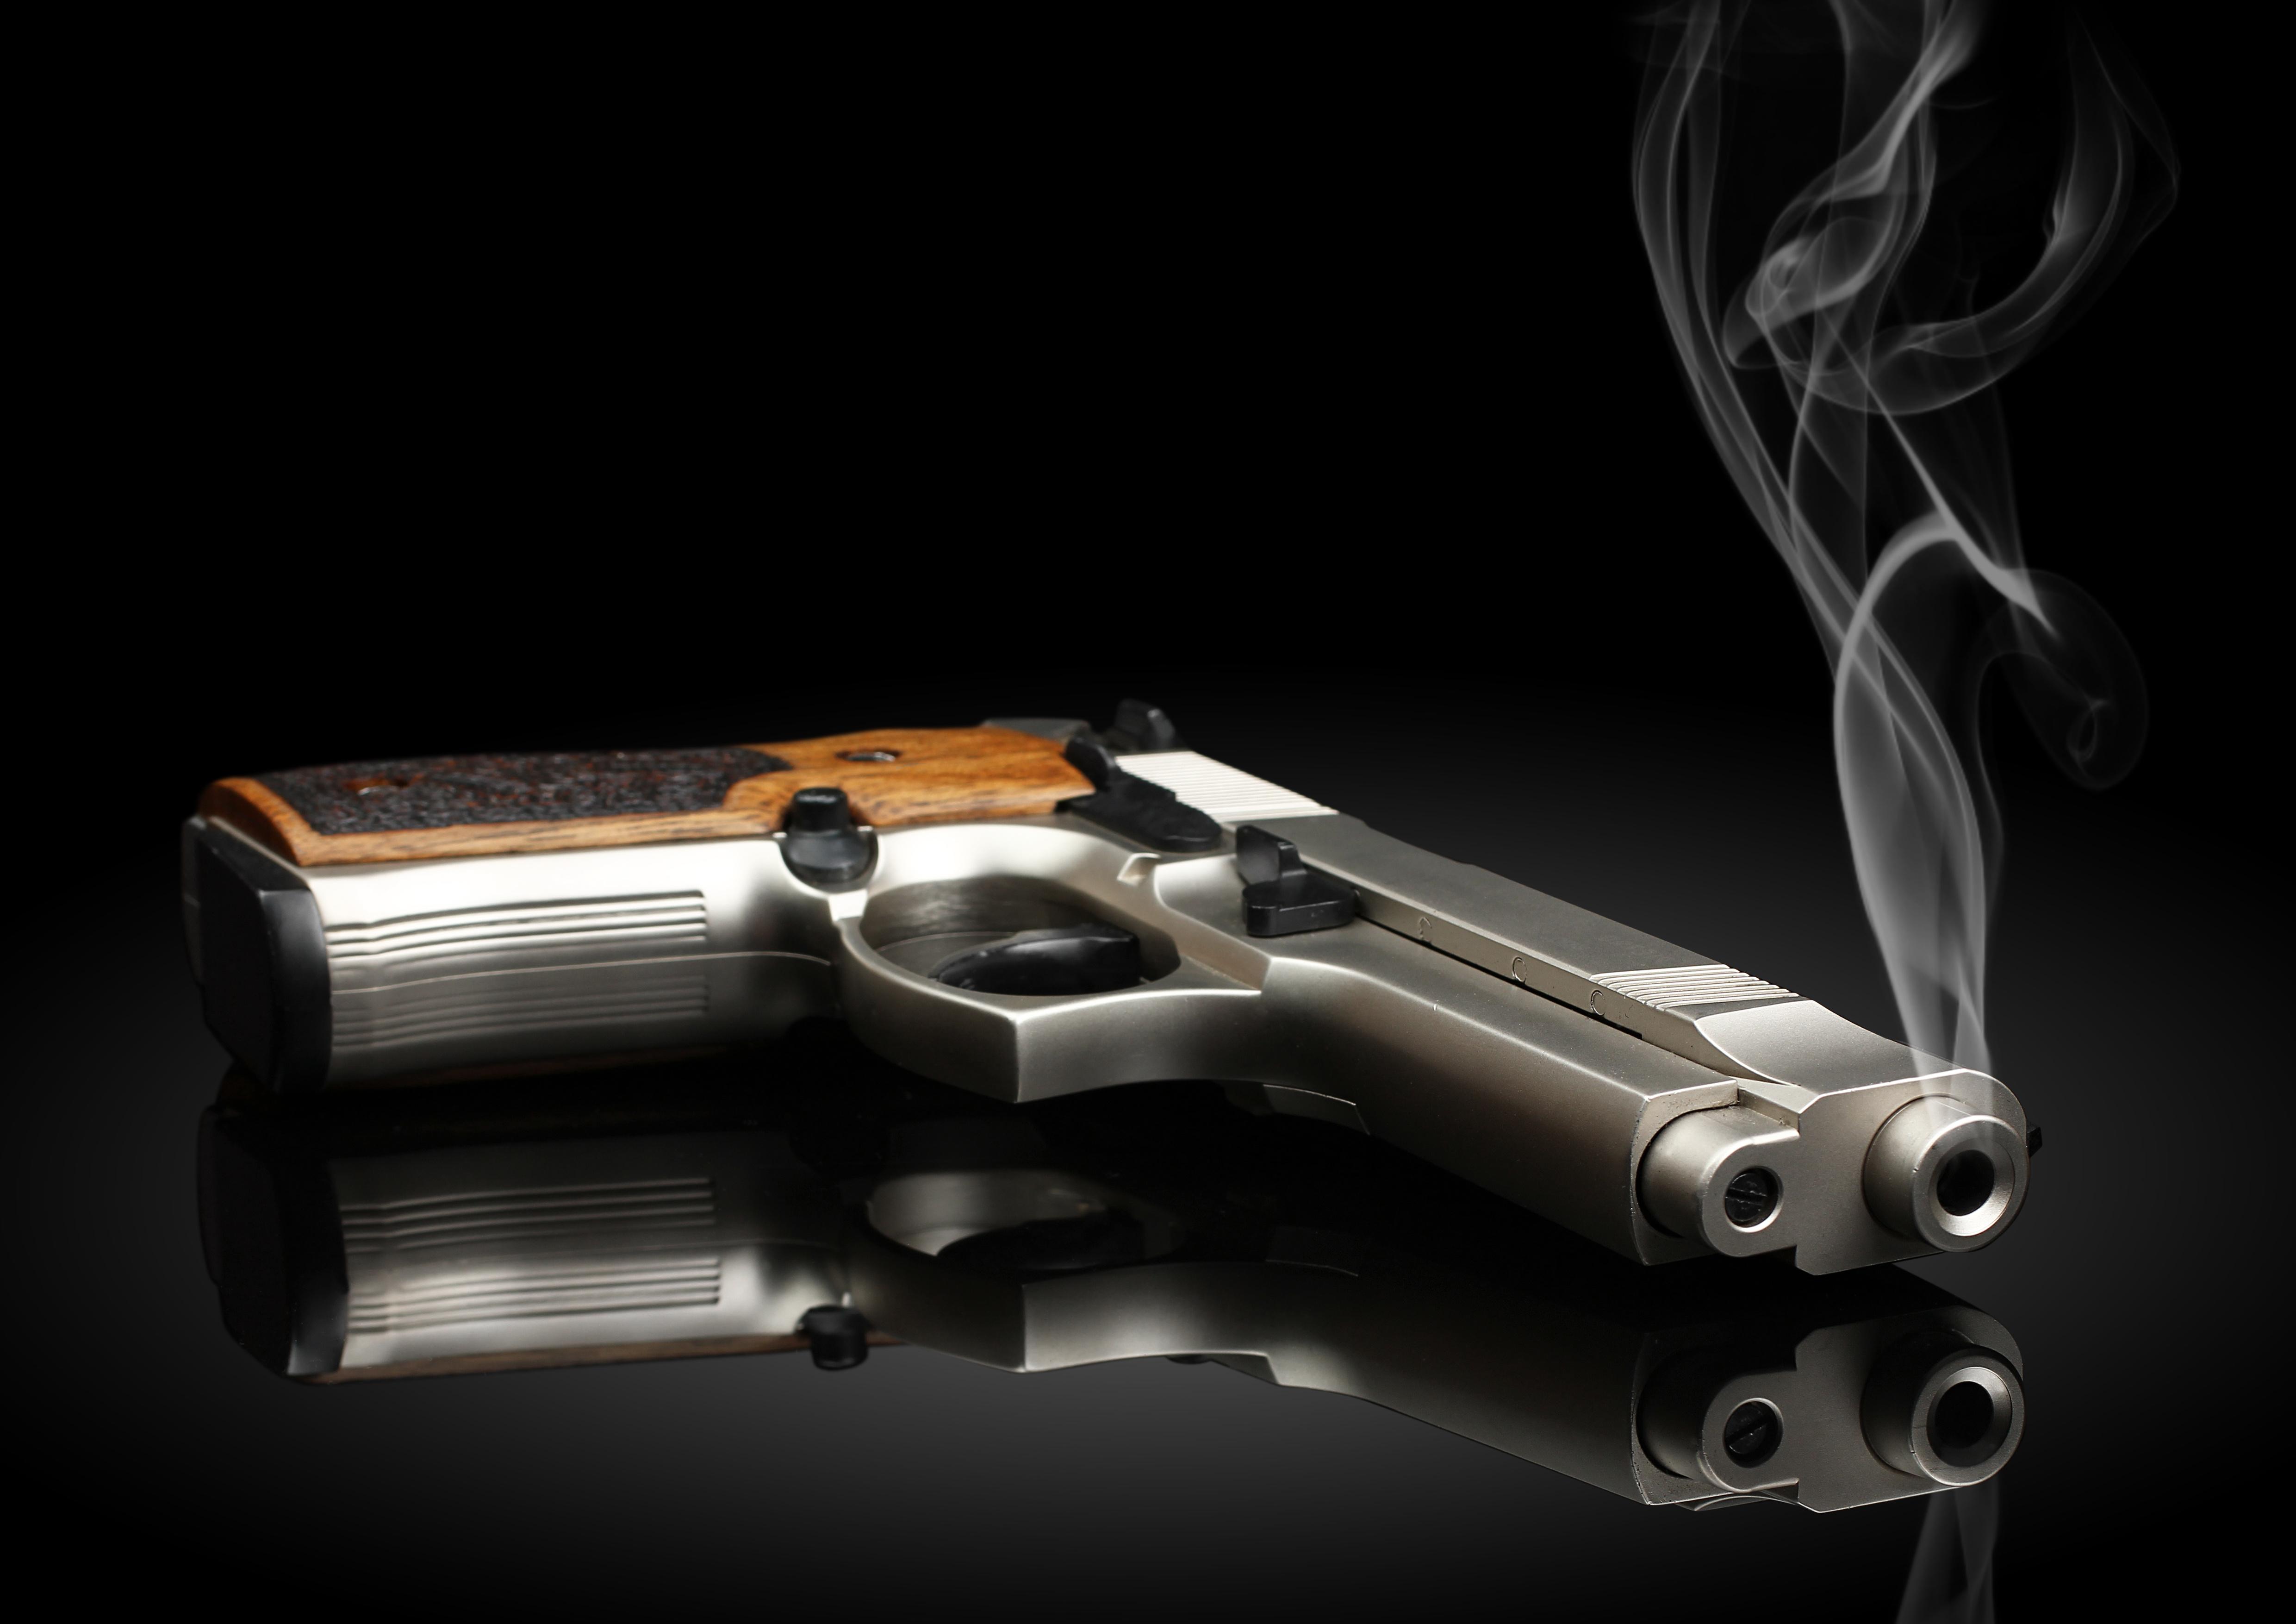 america and guns wallpaper - photo #36